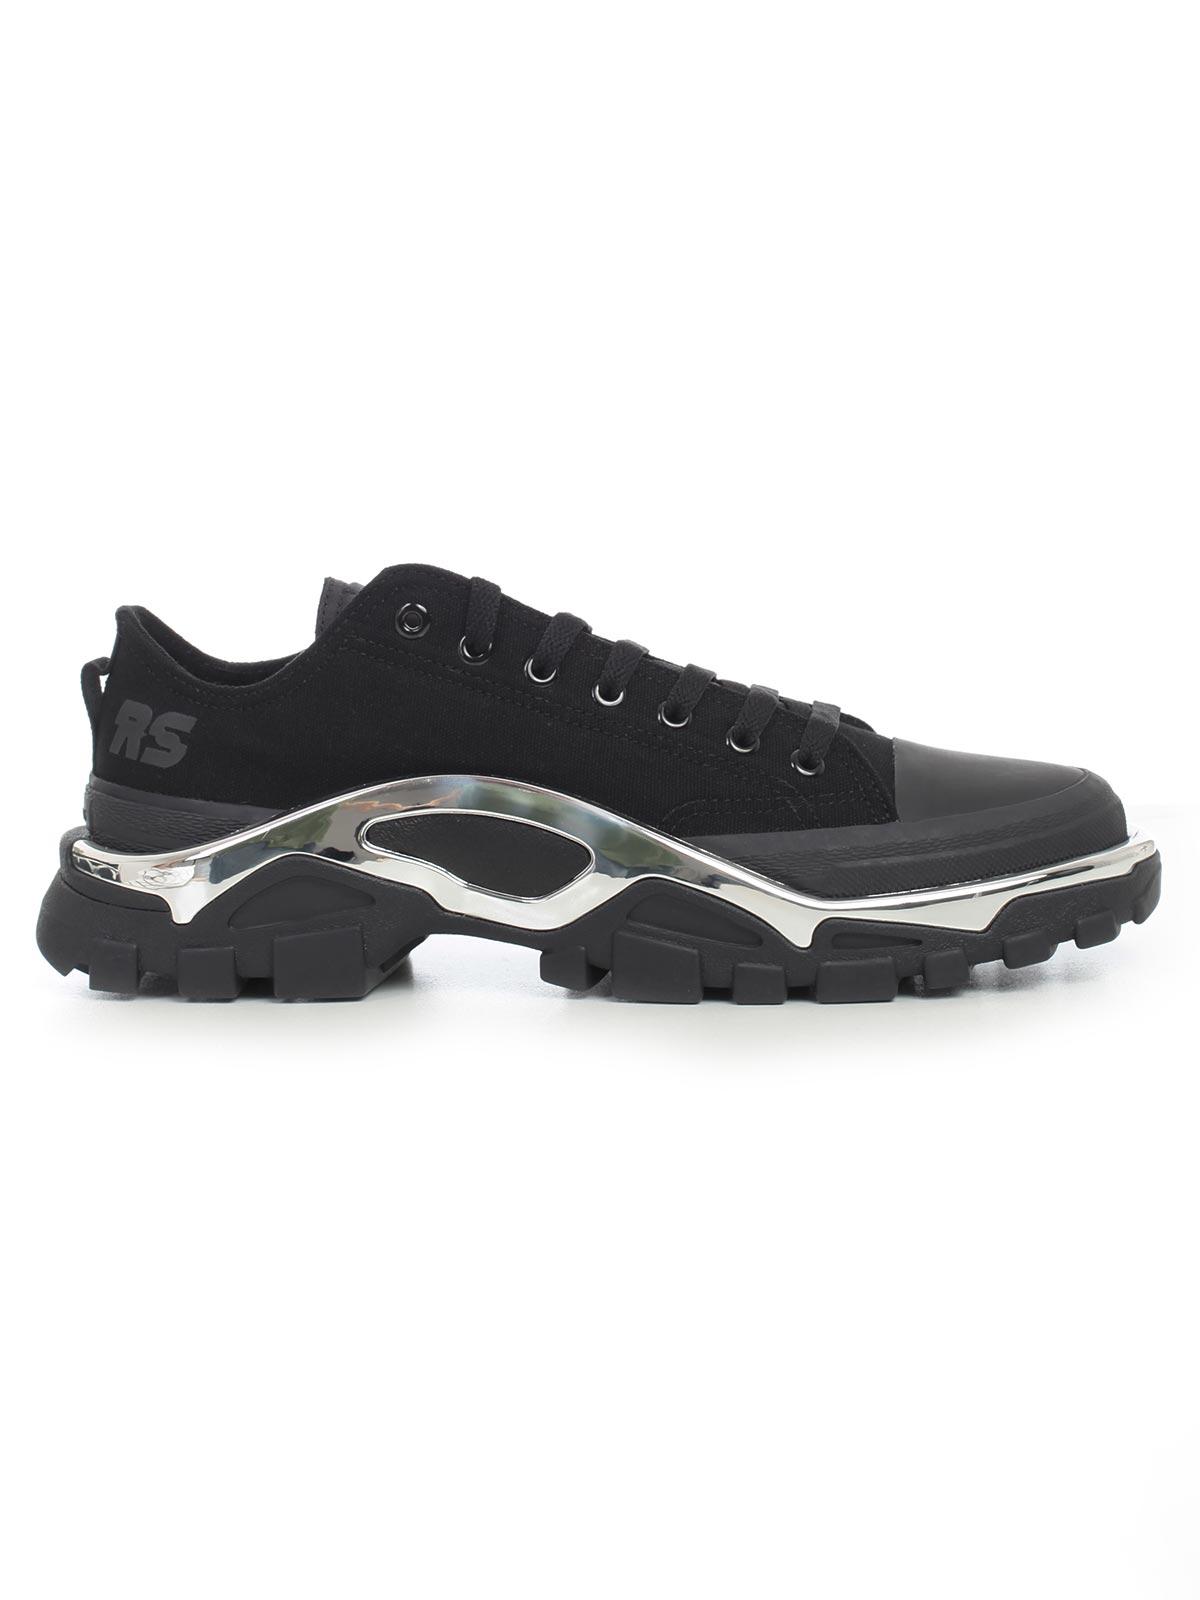 3acb01d9fe9343 Adidas X Raf Simons Shoes F34243 - CBLACK CBLACK CBLACK.Bernardelli Store -  Online fashion store for Men and Women